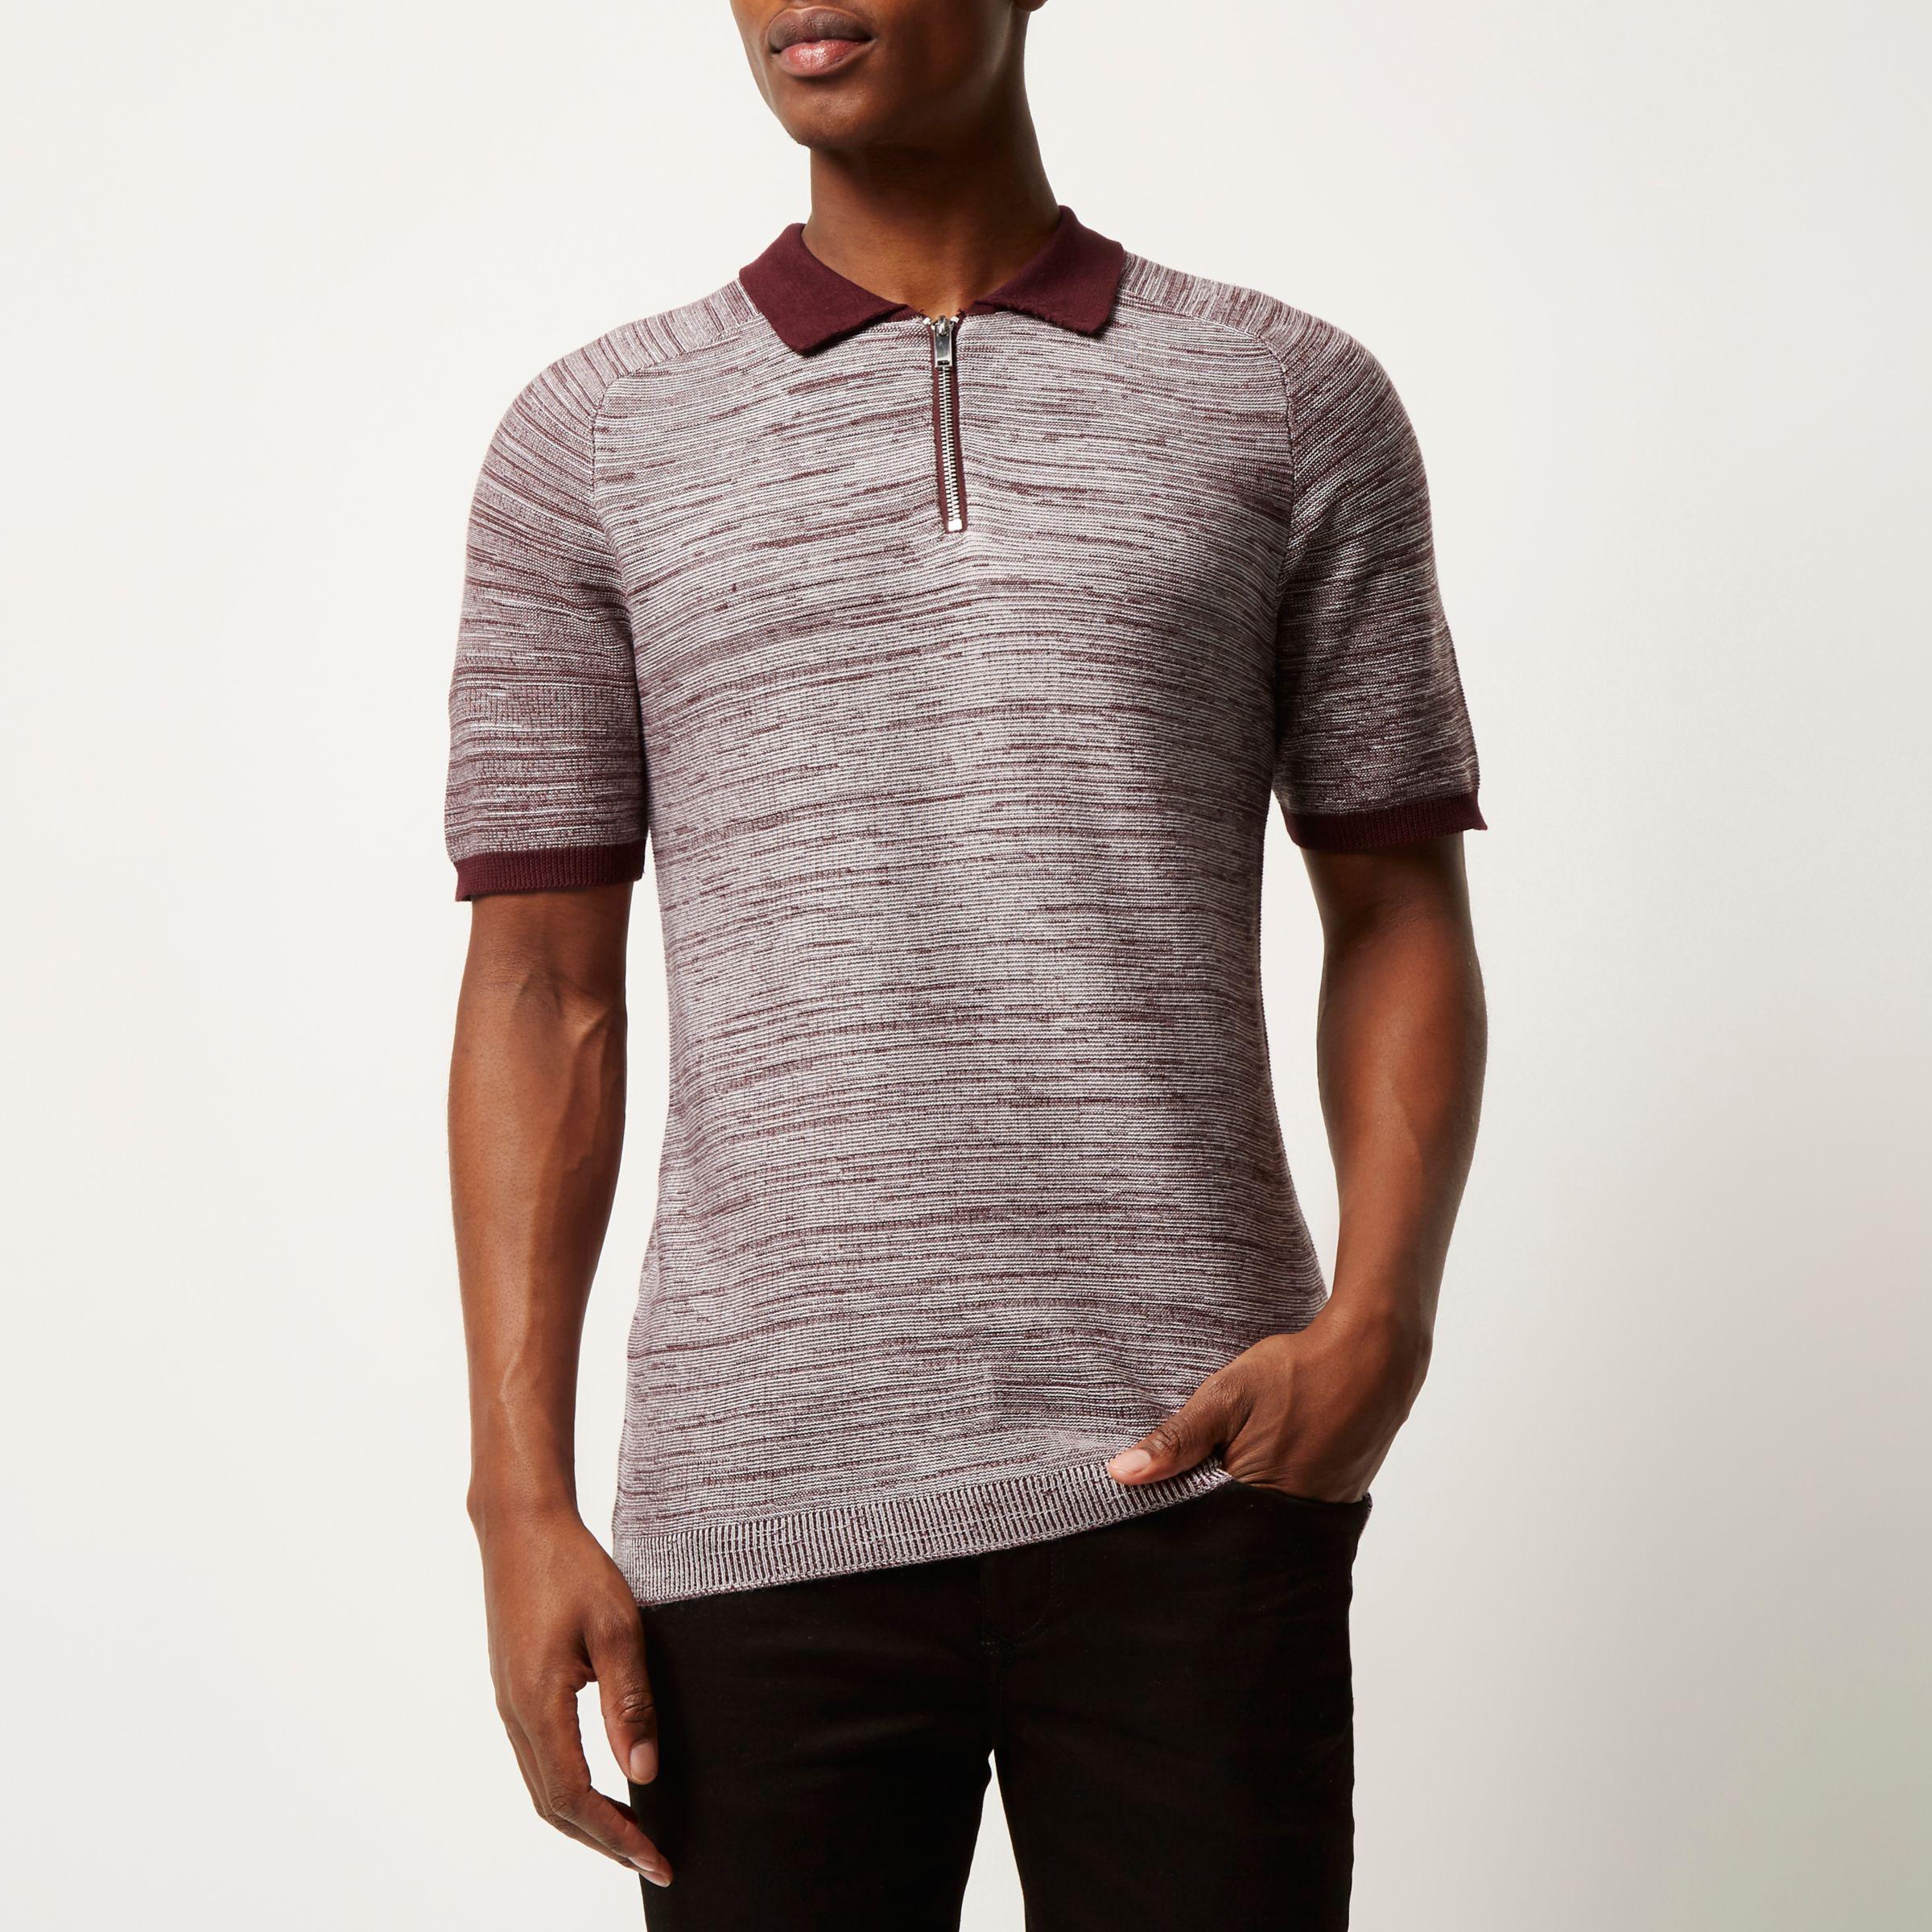 3b5f4fe3 River Island Burgundy Textured Zip-up Polo Shirt for Men - Lyst